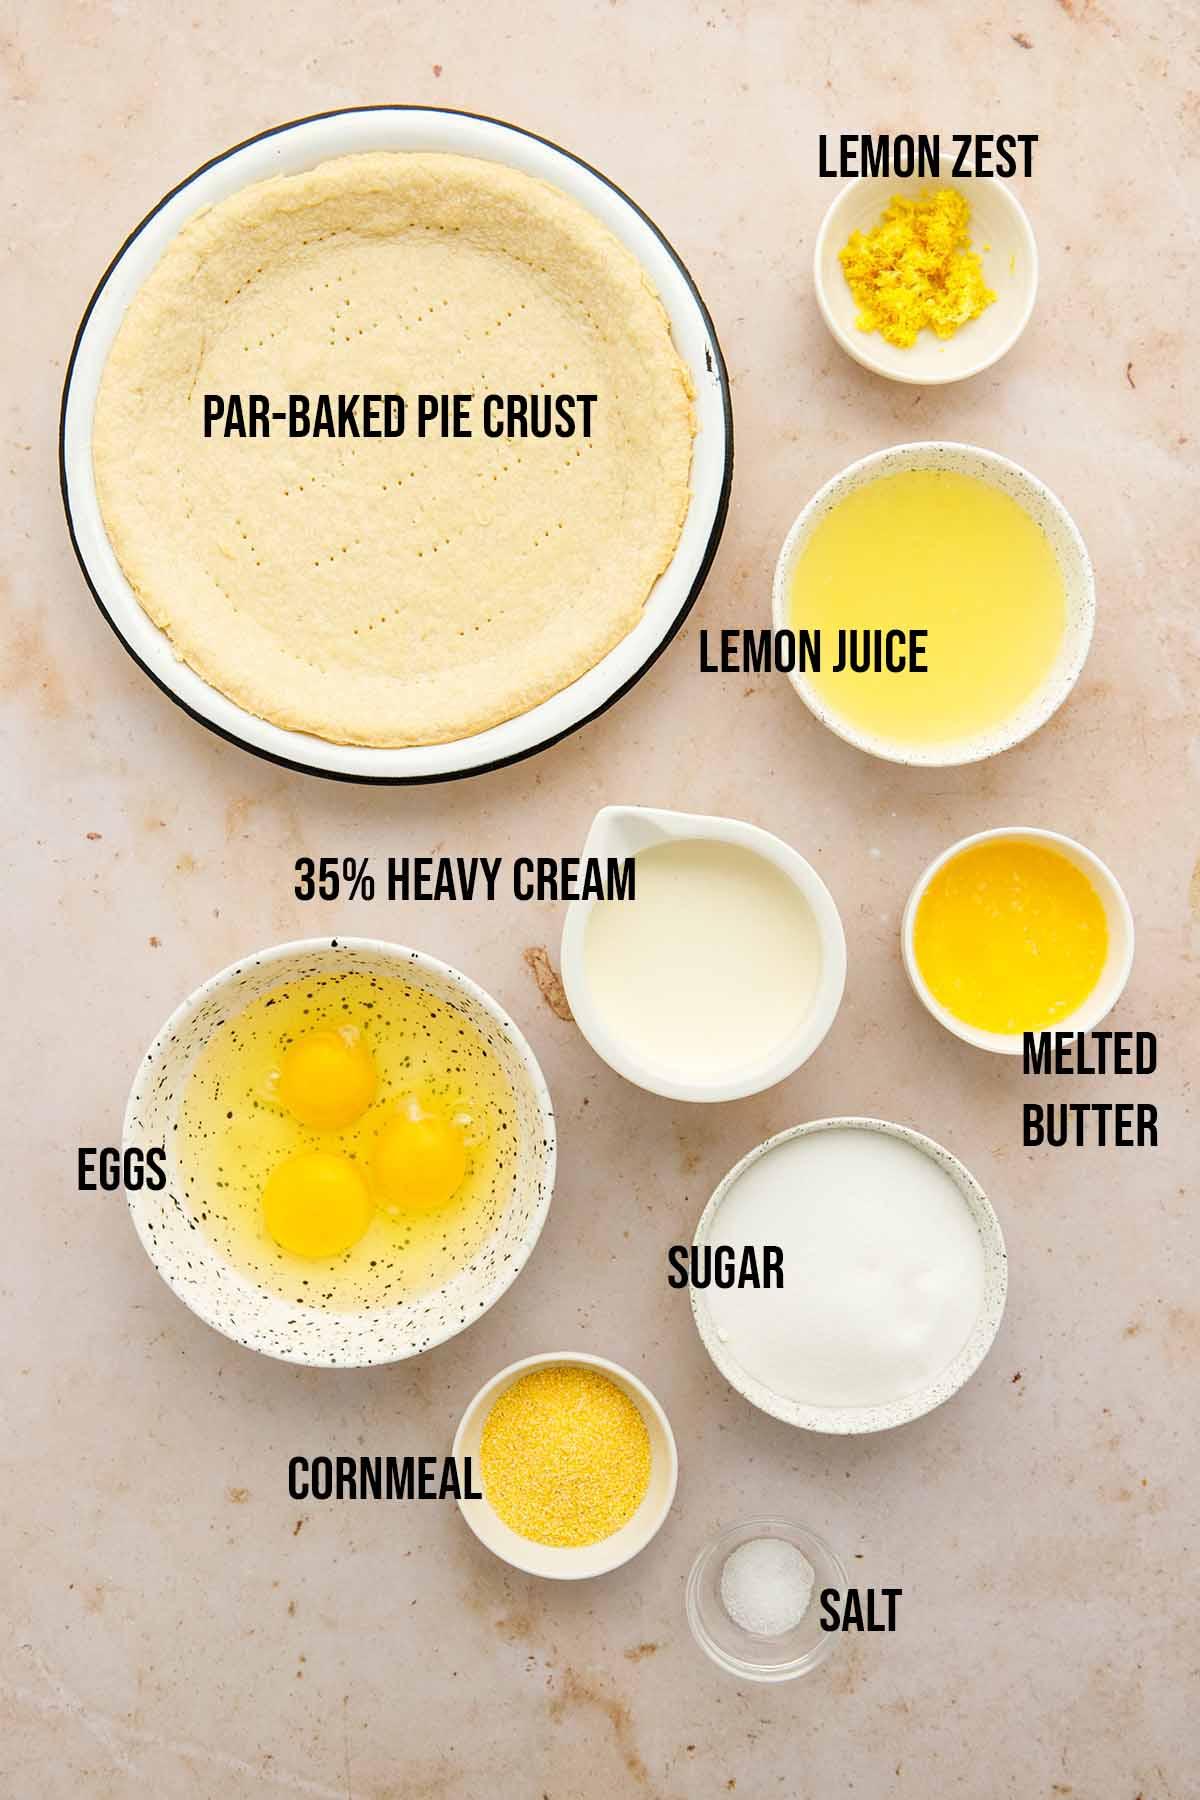 Ingredients to make lemon chess pie.